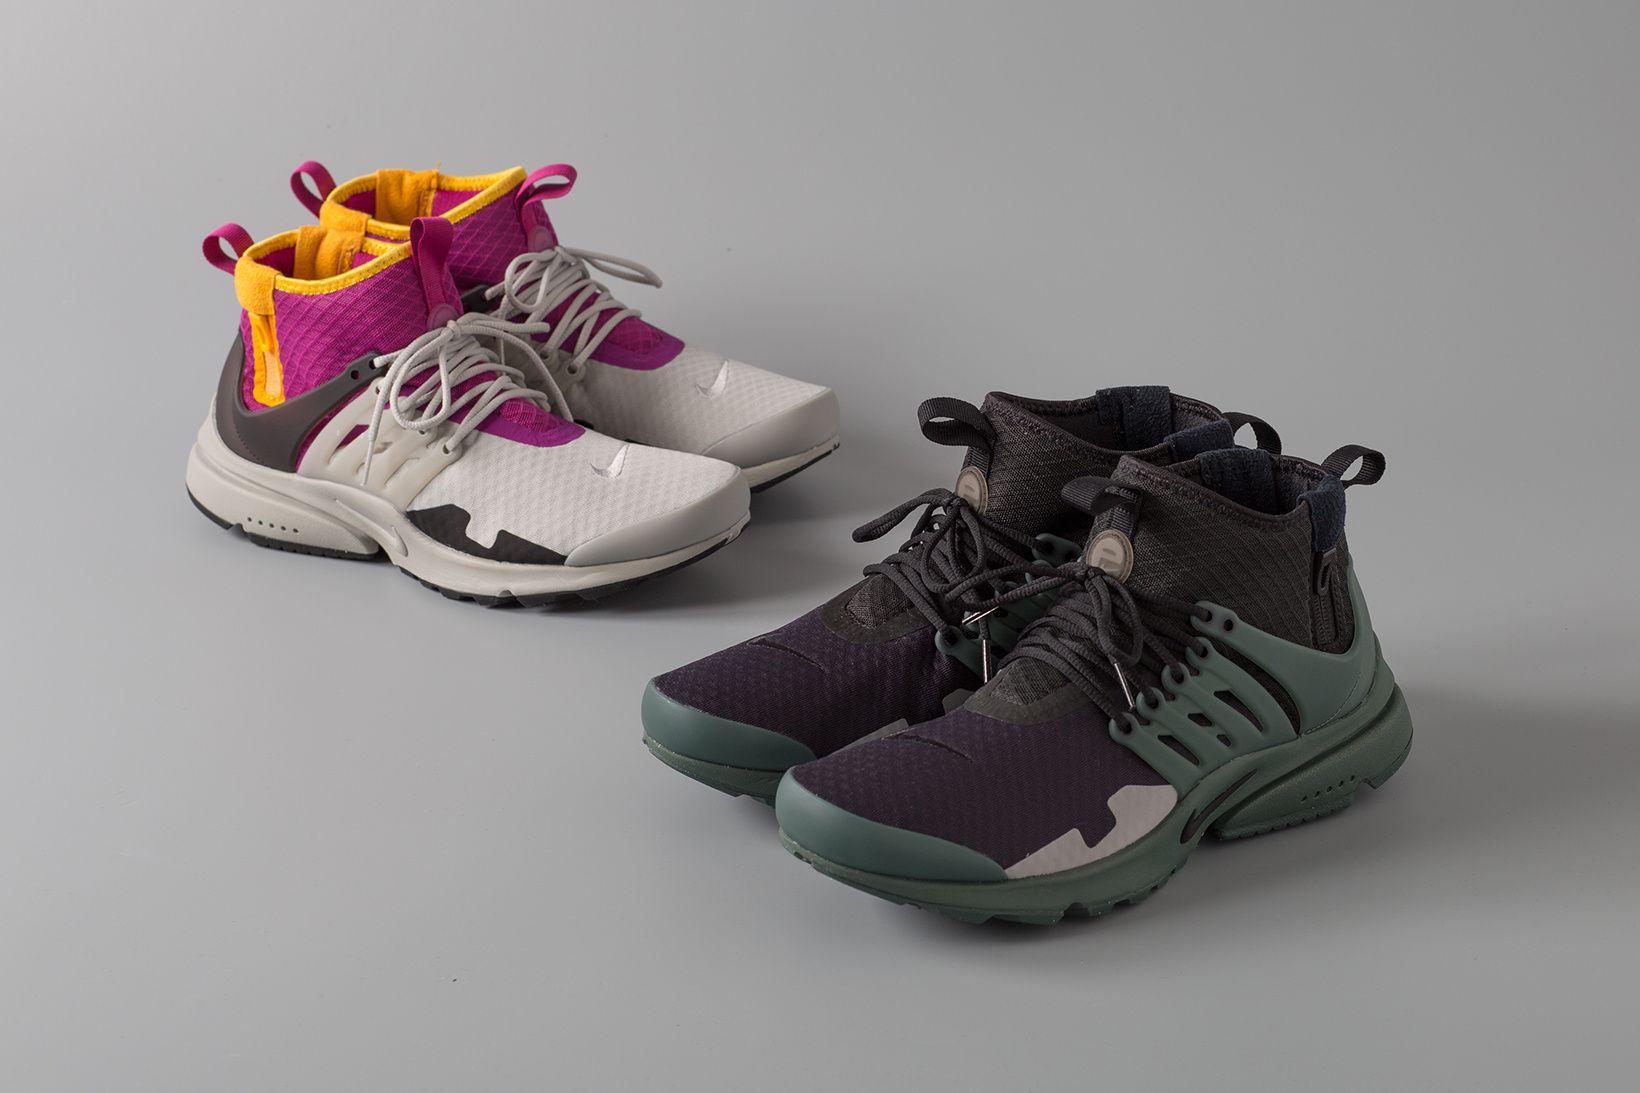 Nike Air Presto Mid Sp 1